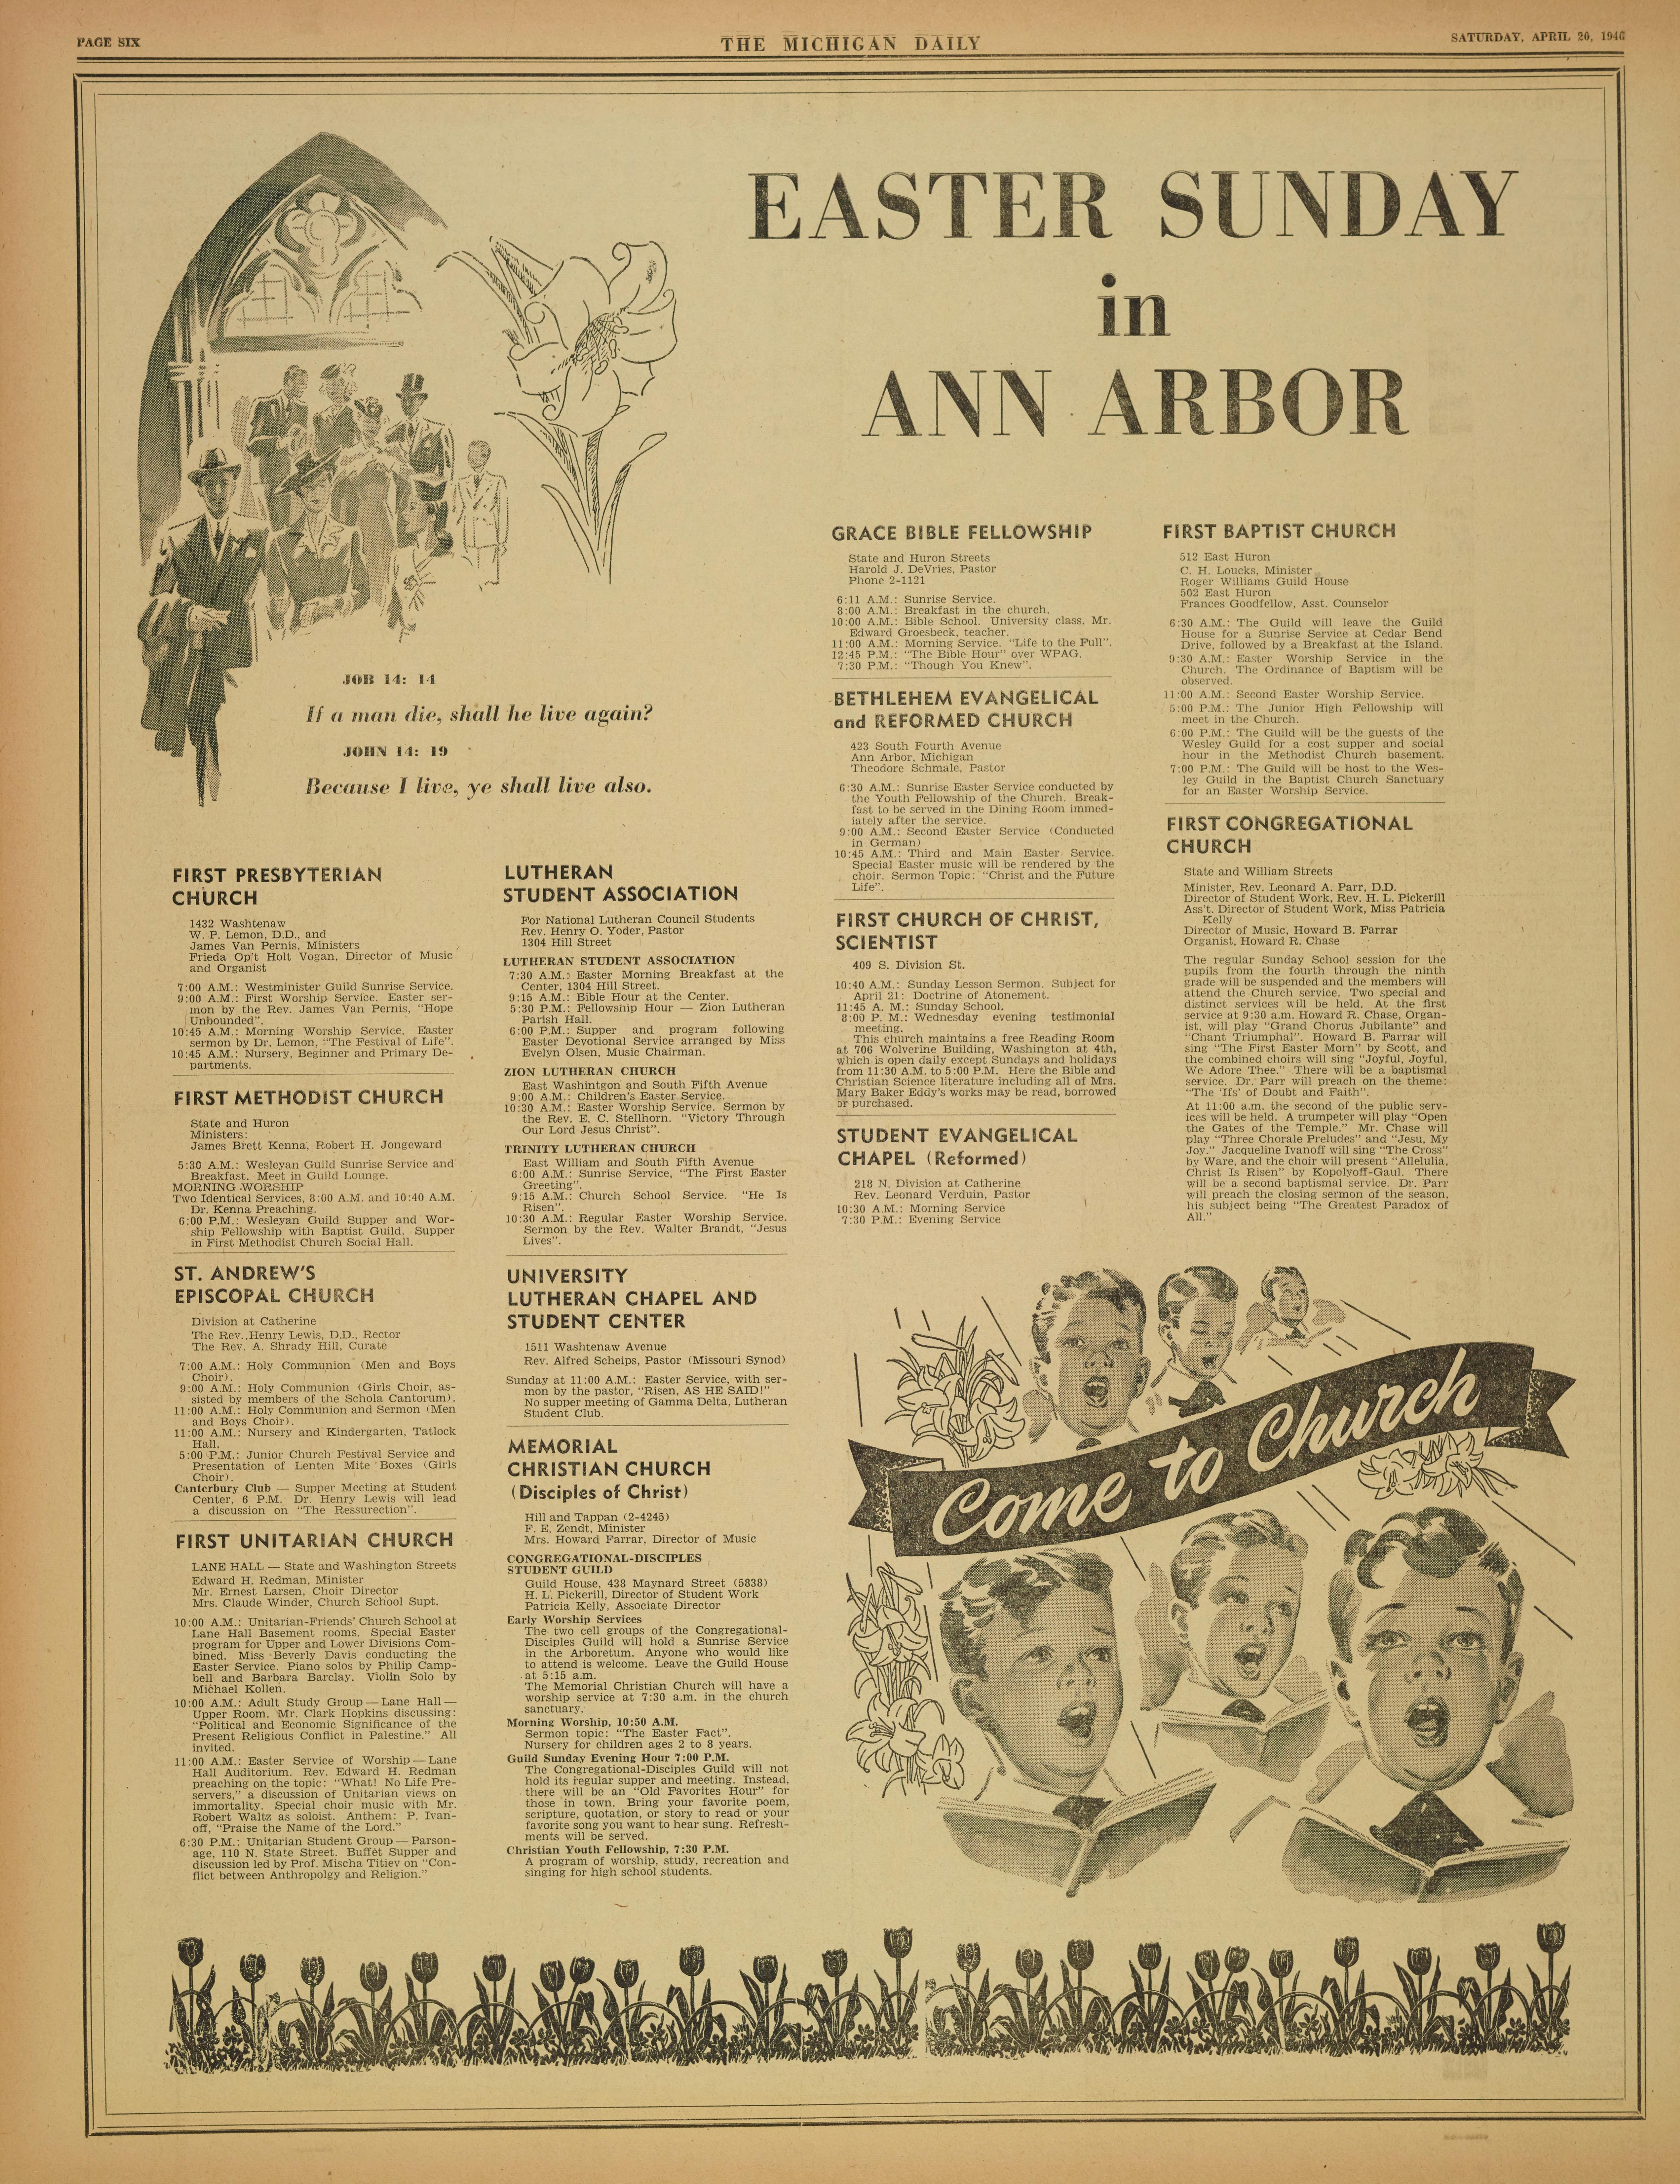 Michigan Daily Digital Archives - April 20, 1946 (vol  56, iss  119